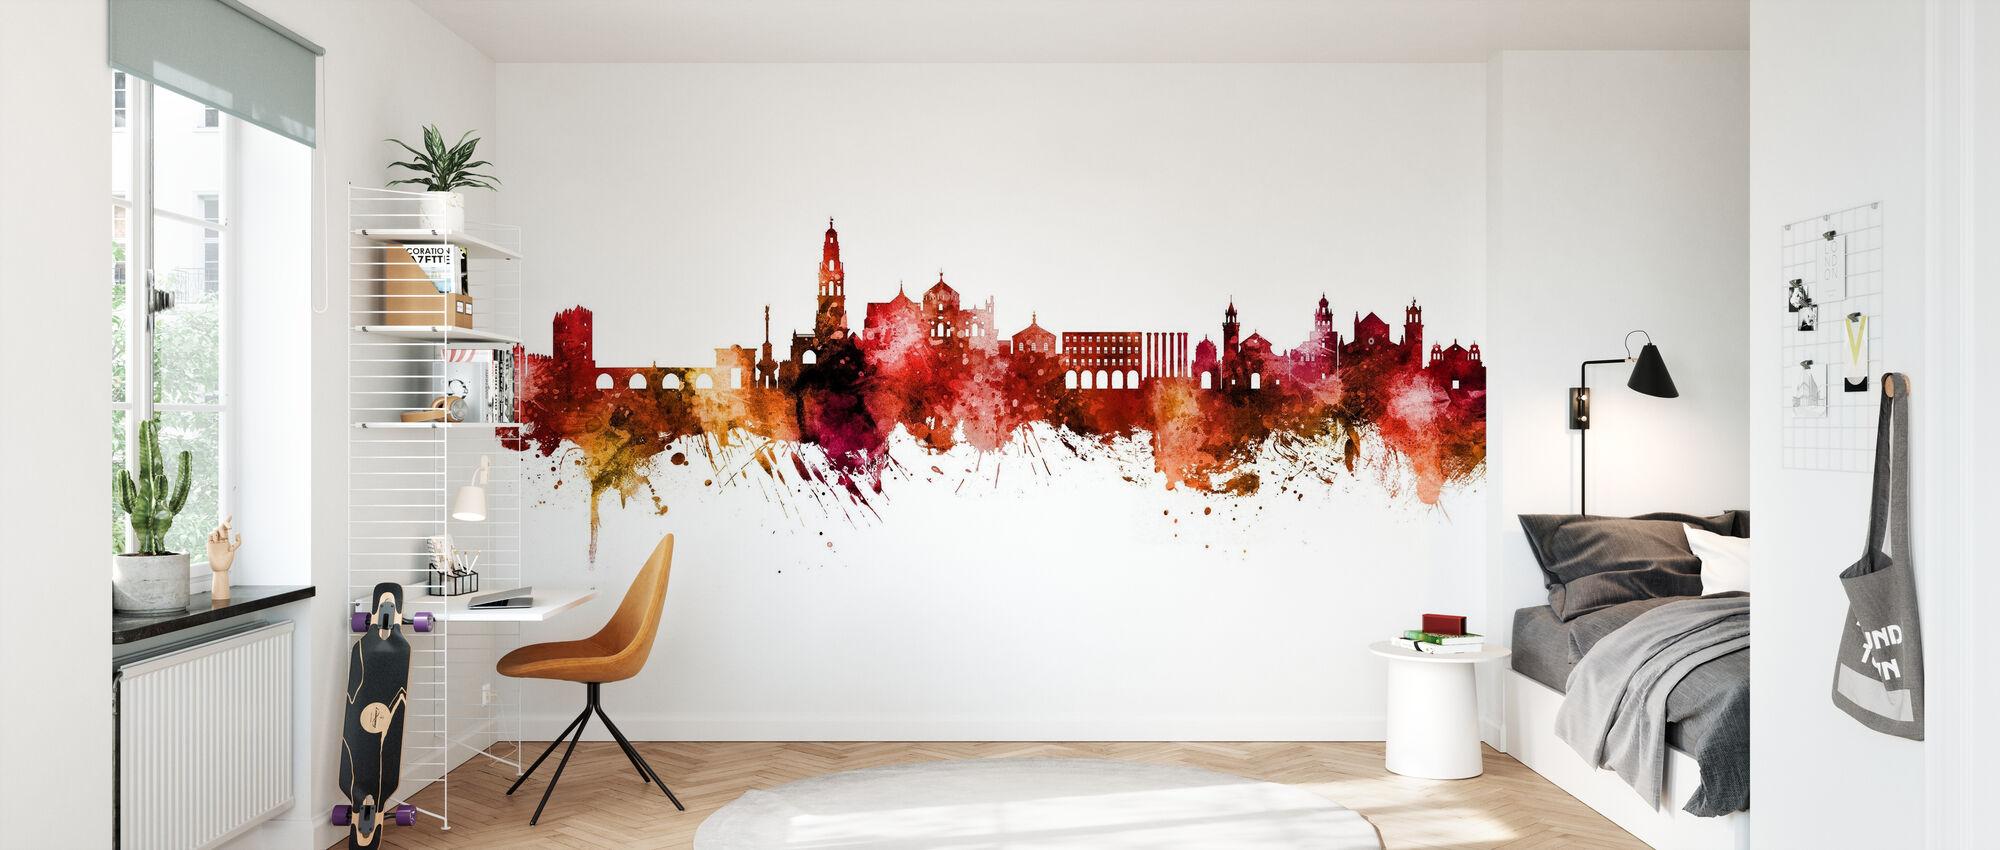 Cordoba Spain Skyline - Wallpaper - Kids Room